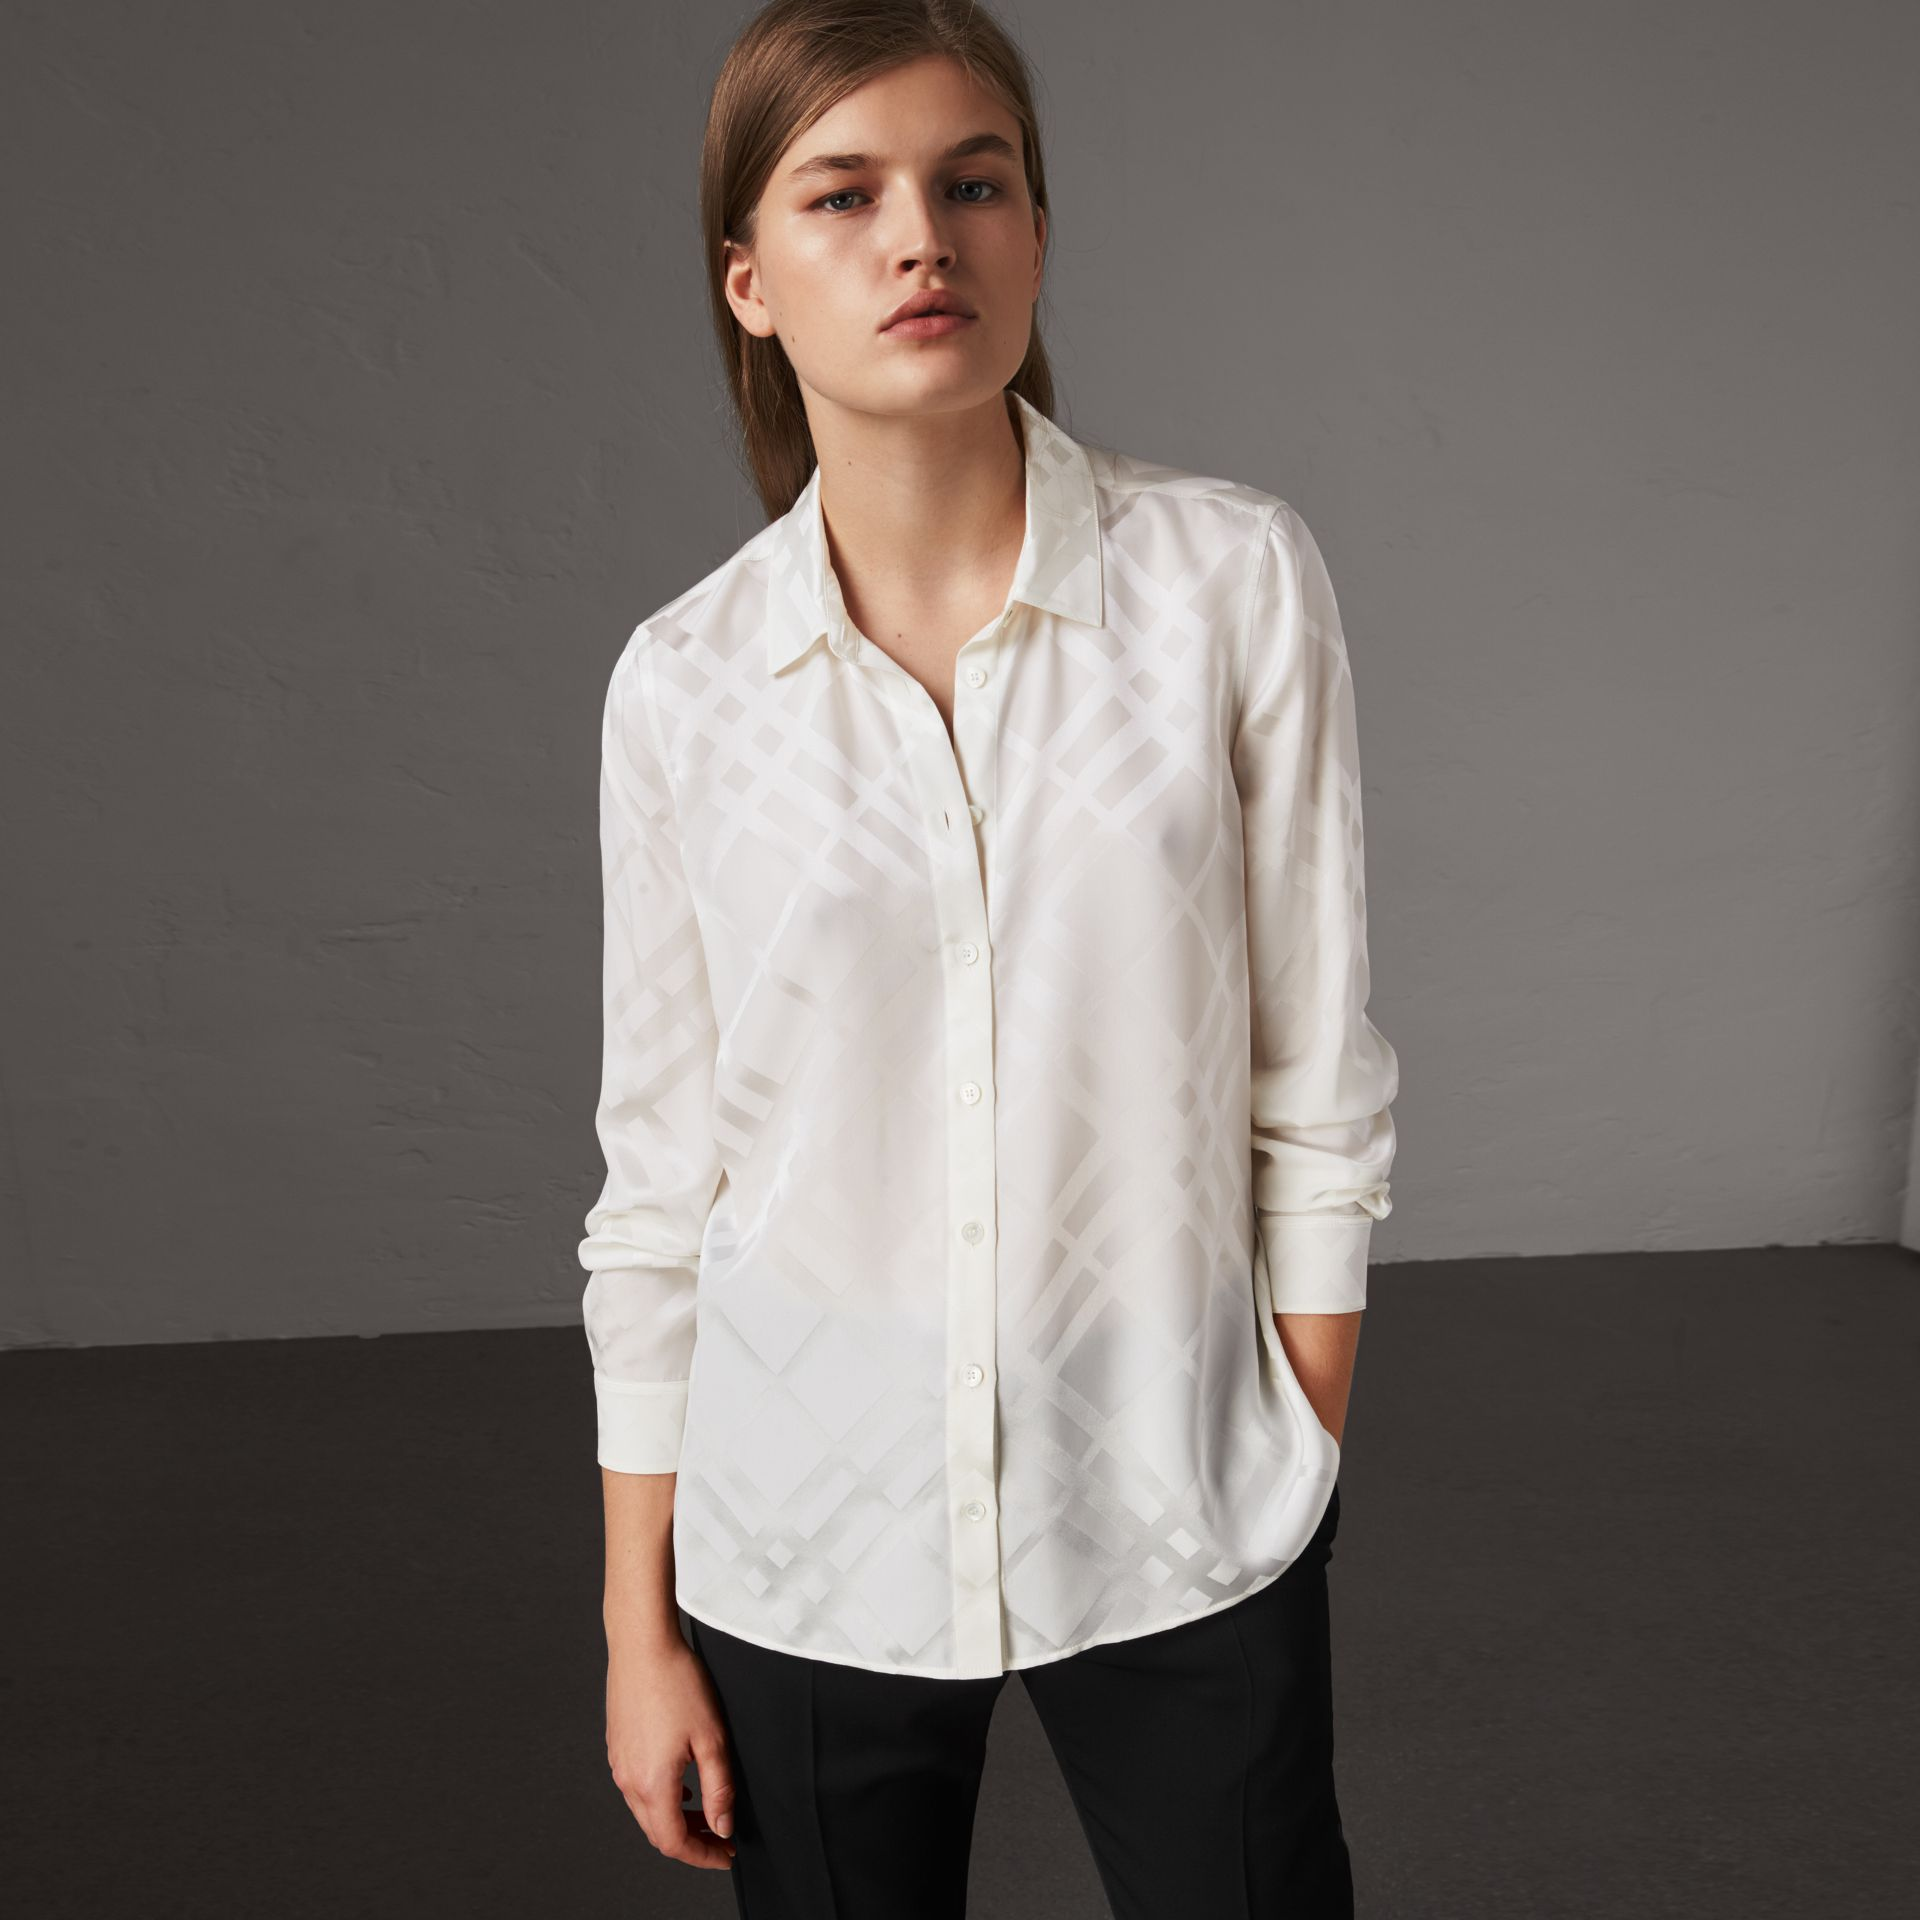 Tonal Check Silk Shirt in White - Women | Burberry Australia - gallery image 1